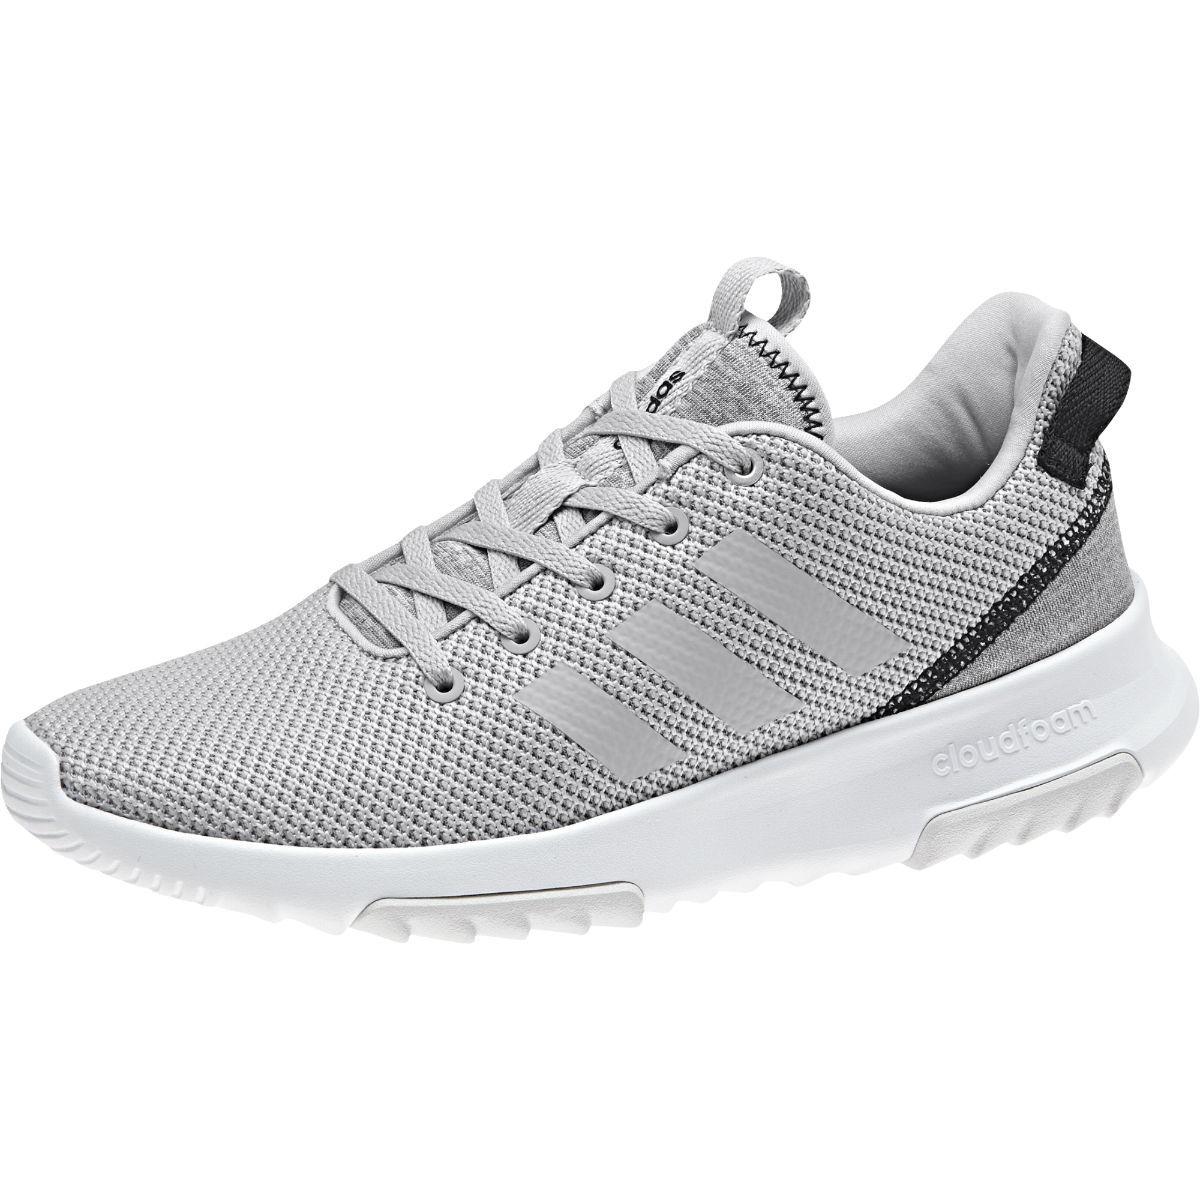 ADIDAS Women's Neo Cloudfoam Racer TR Running Shoes, Grey/Black